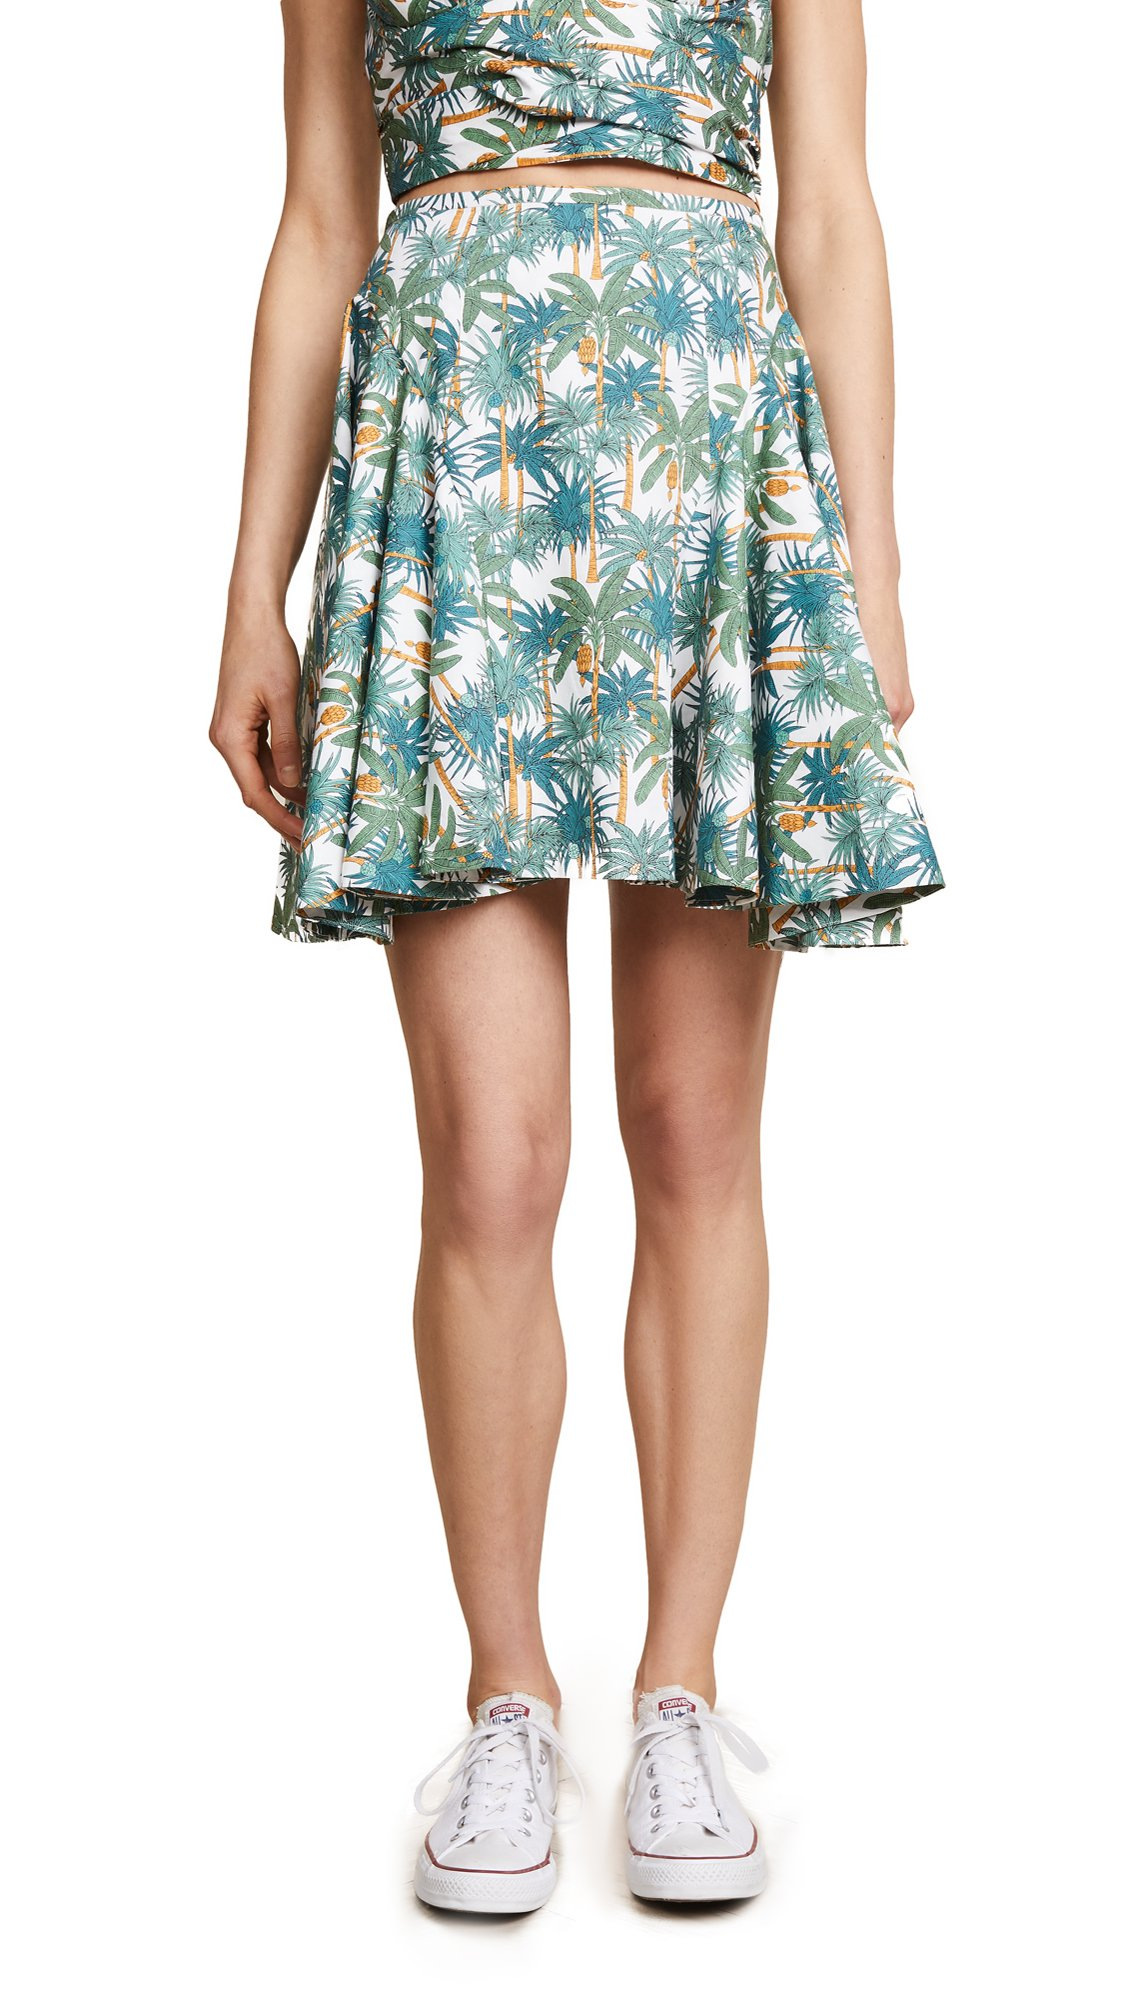 Petersyn Women's Brandy Skirt, Island Print, X-Small